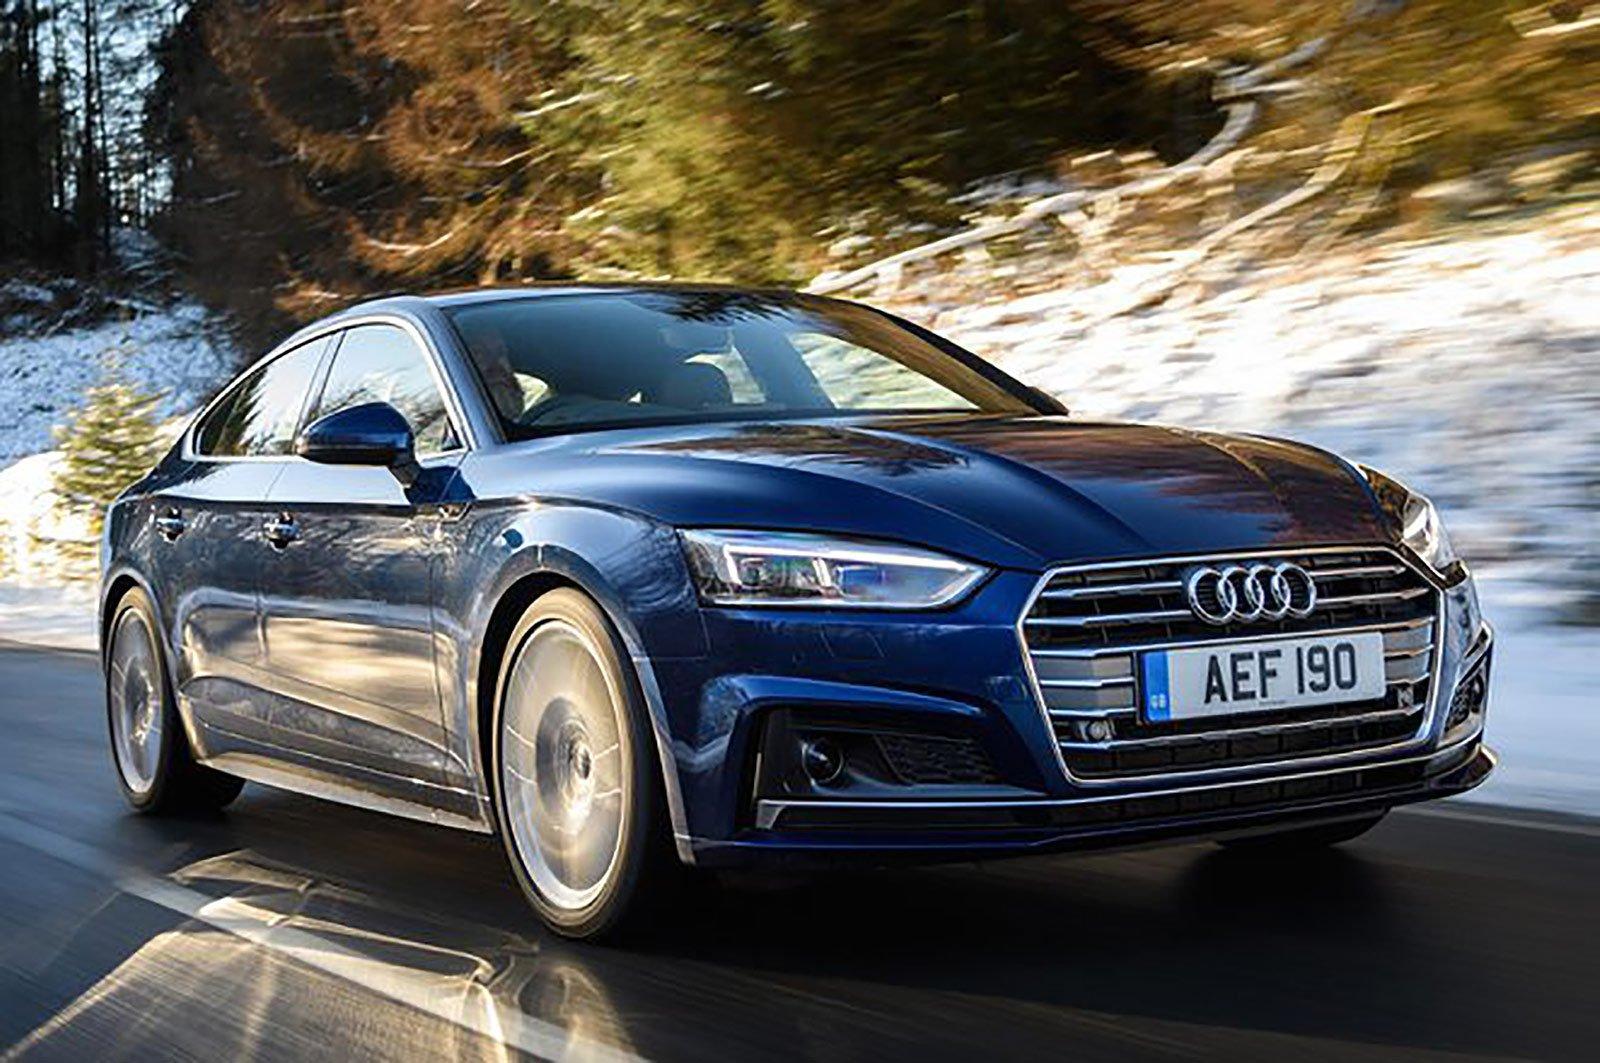 Audi A5 Sportback front